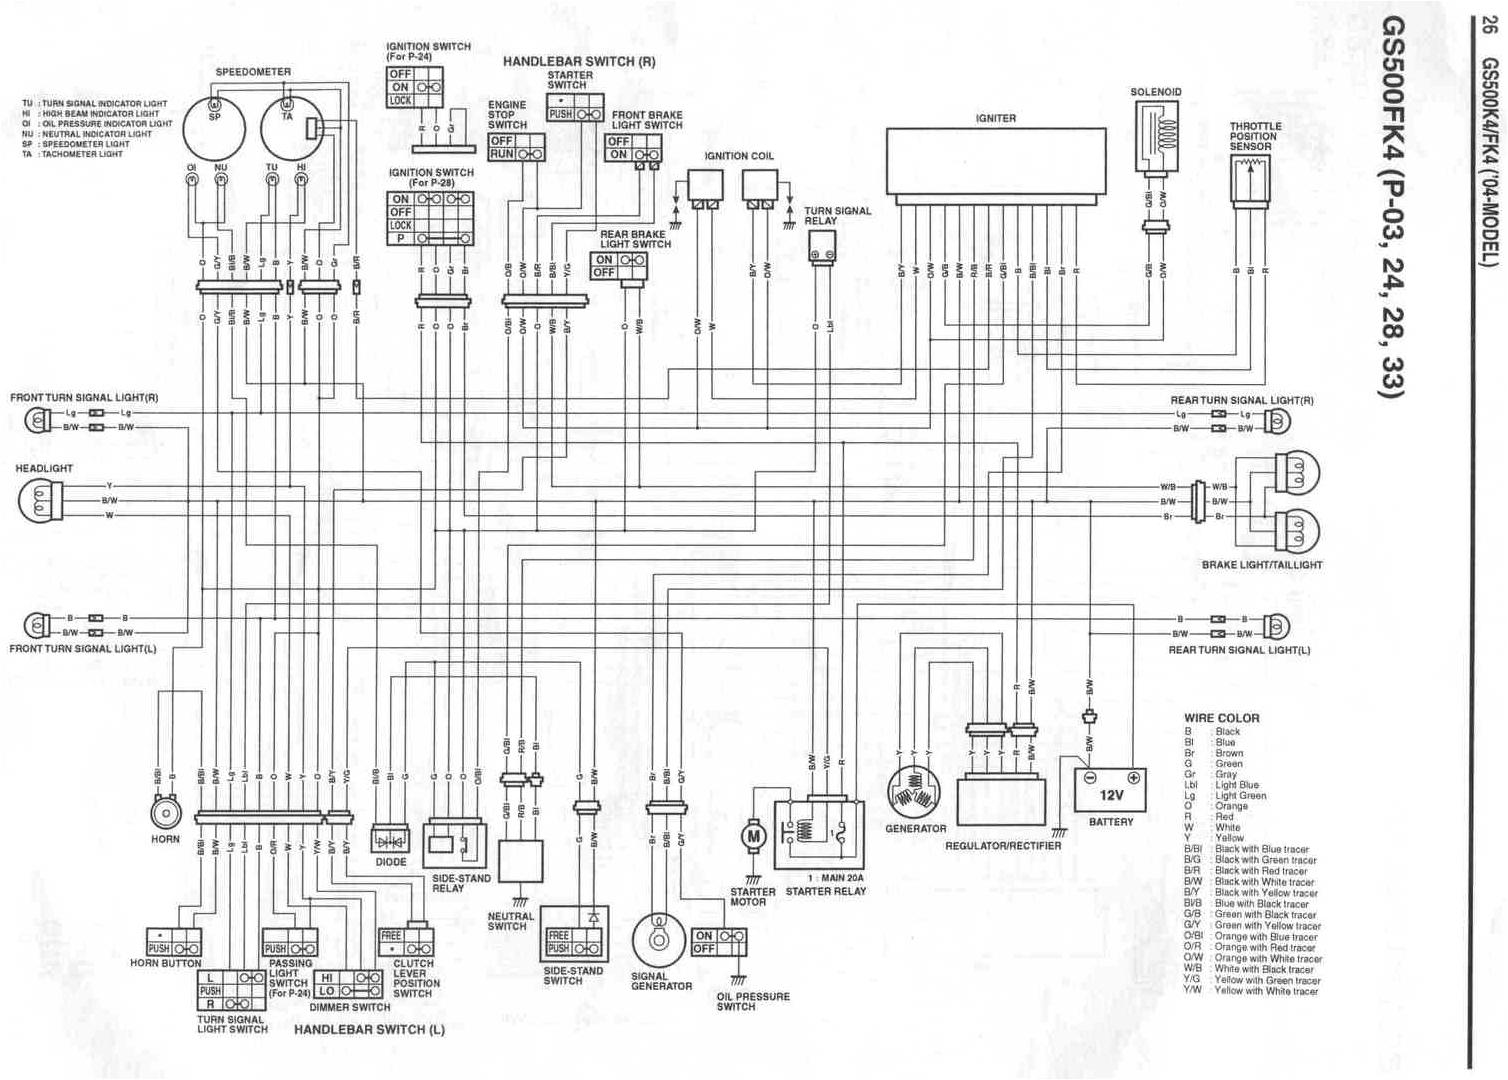 wire diagram gs500f 06 wiring diagram localwire diagram gs500f 06